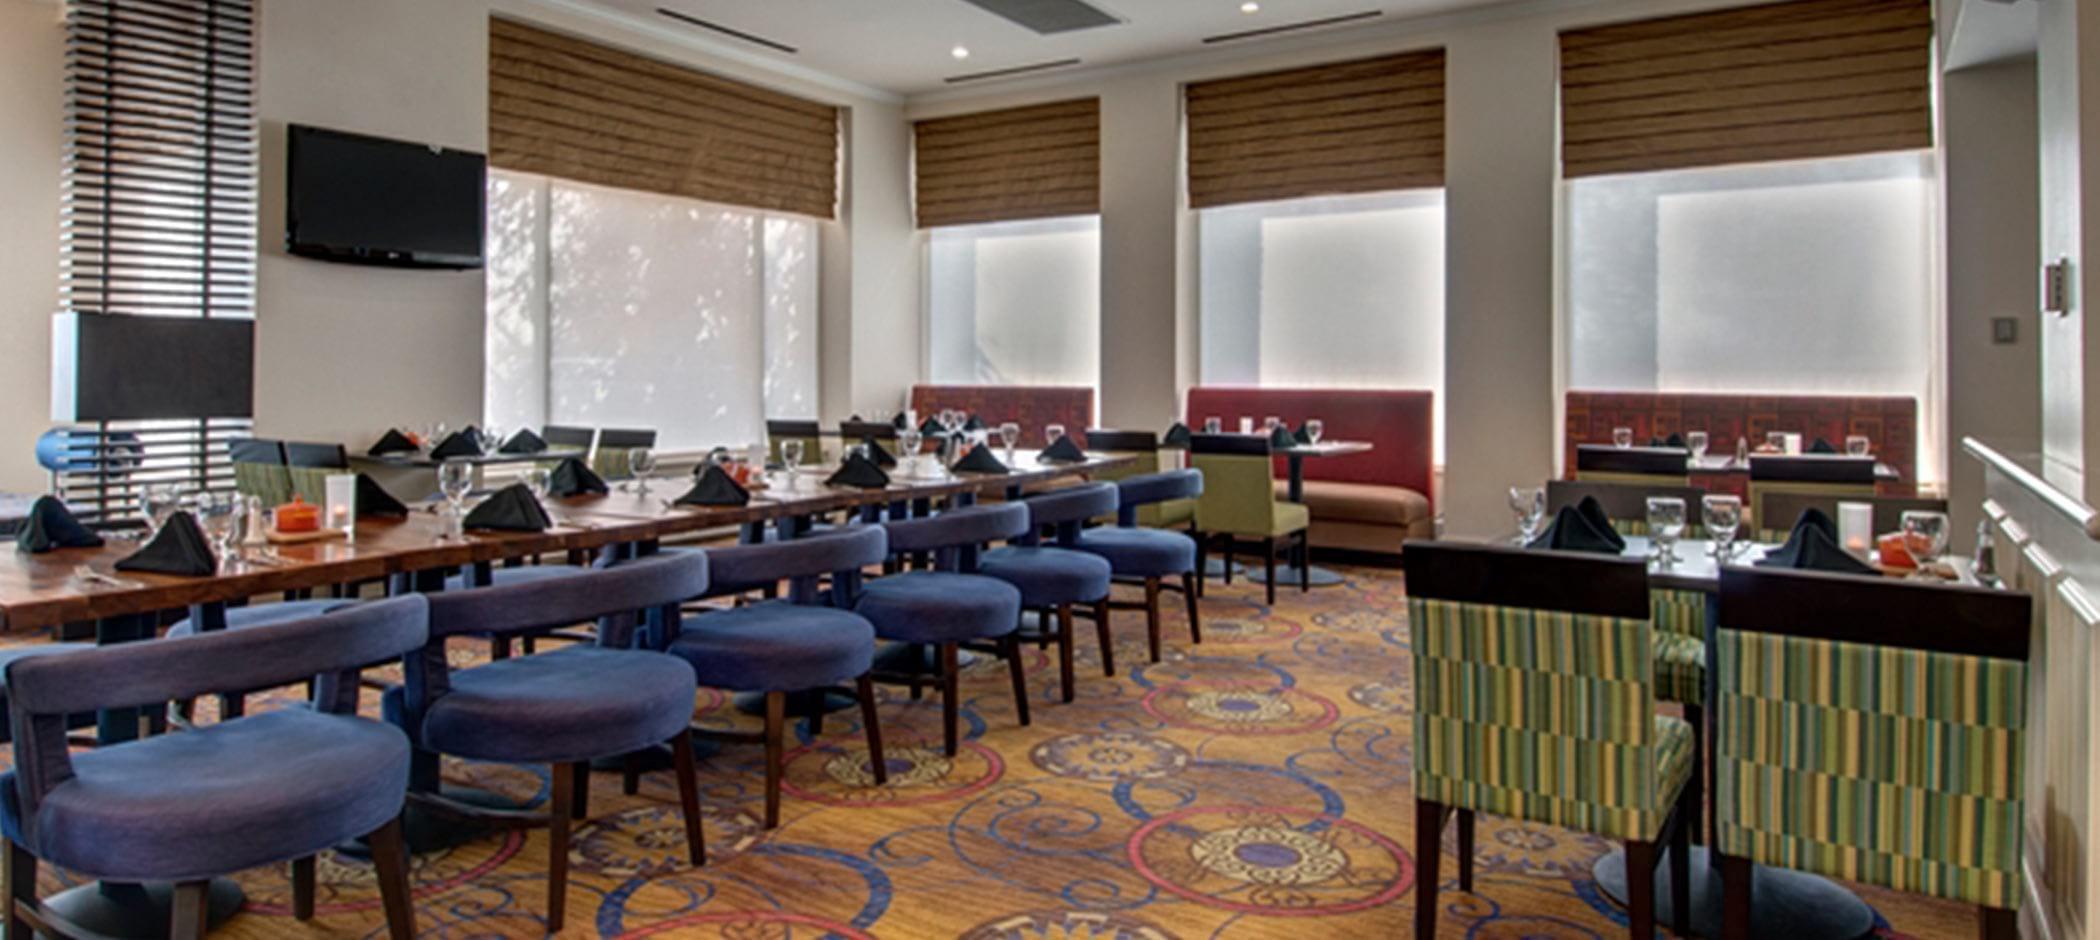 Hilton Garden Inn Detroit Metro Airport restaurant